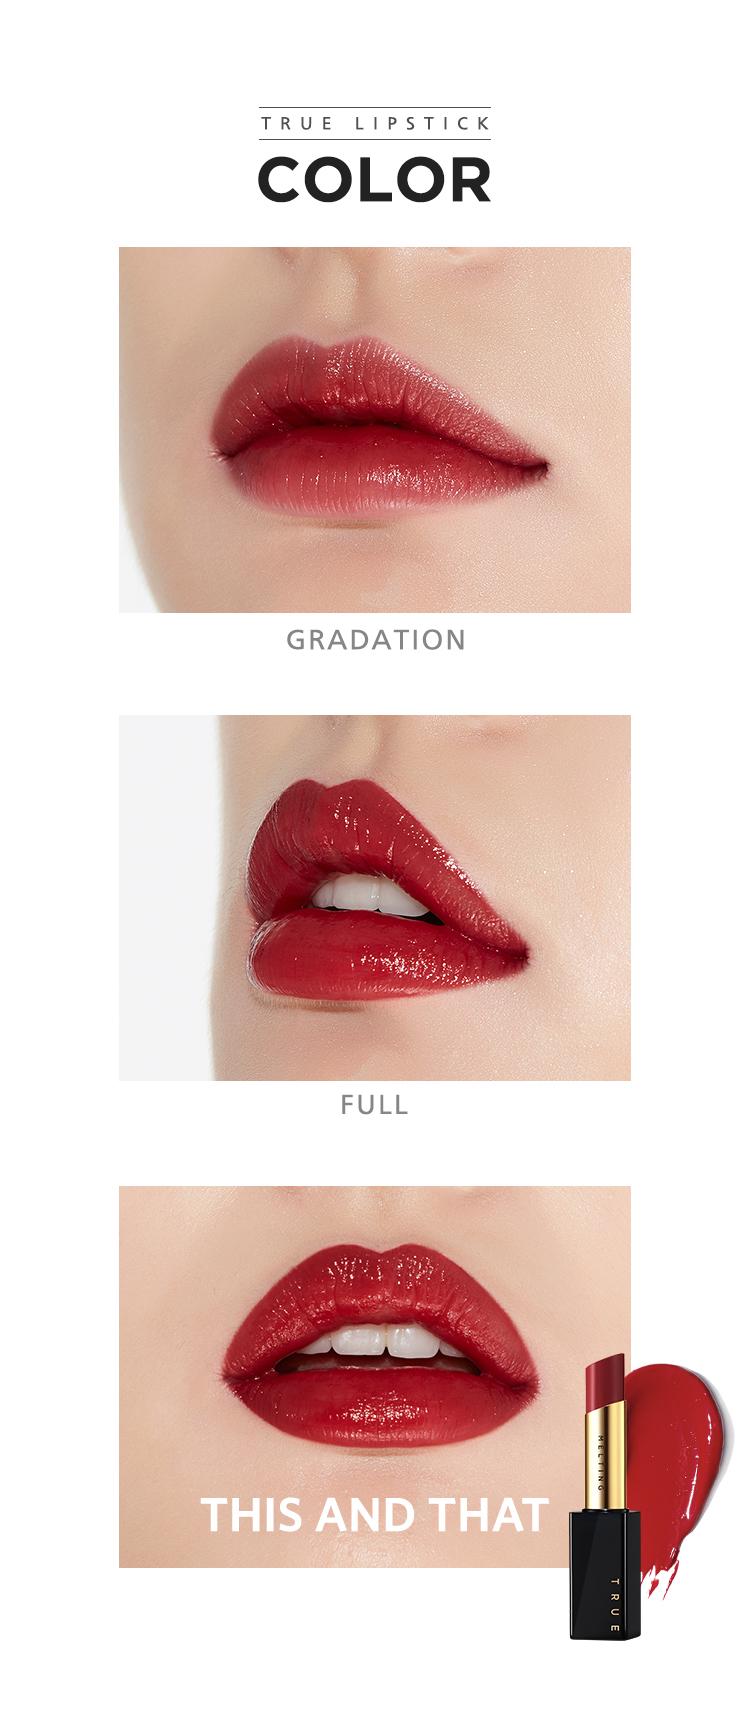 APIEU_True_Melting_Lipstick_bf_RD03_02.jpg